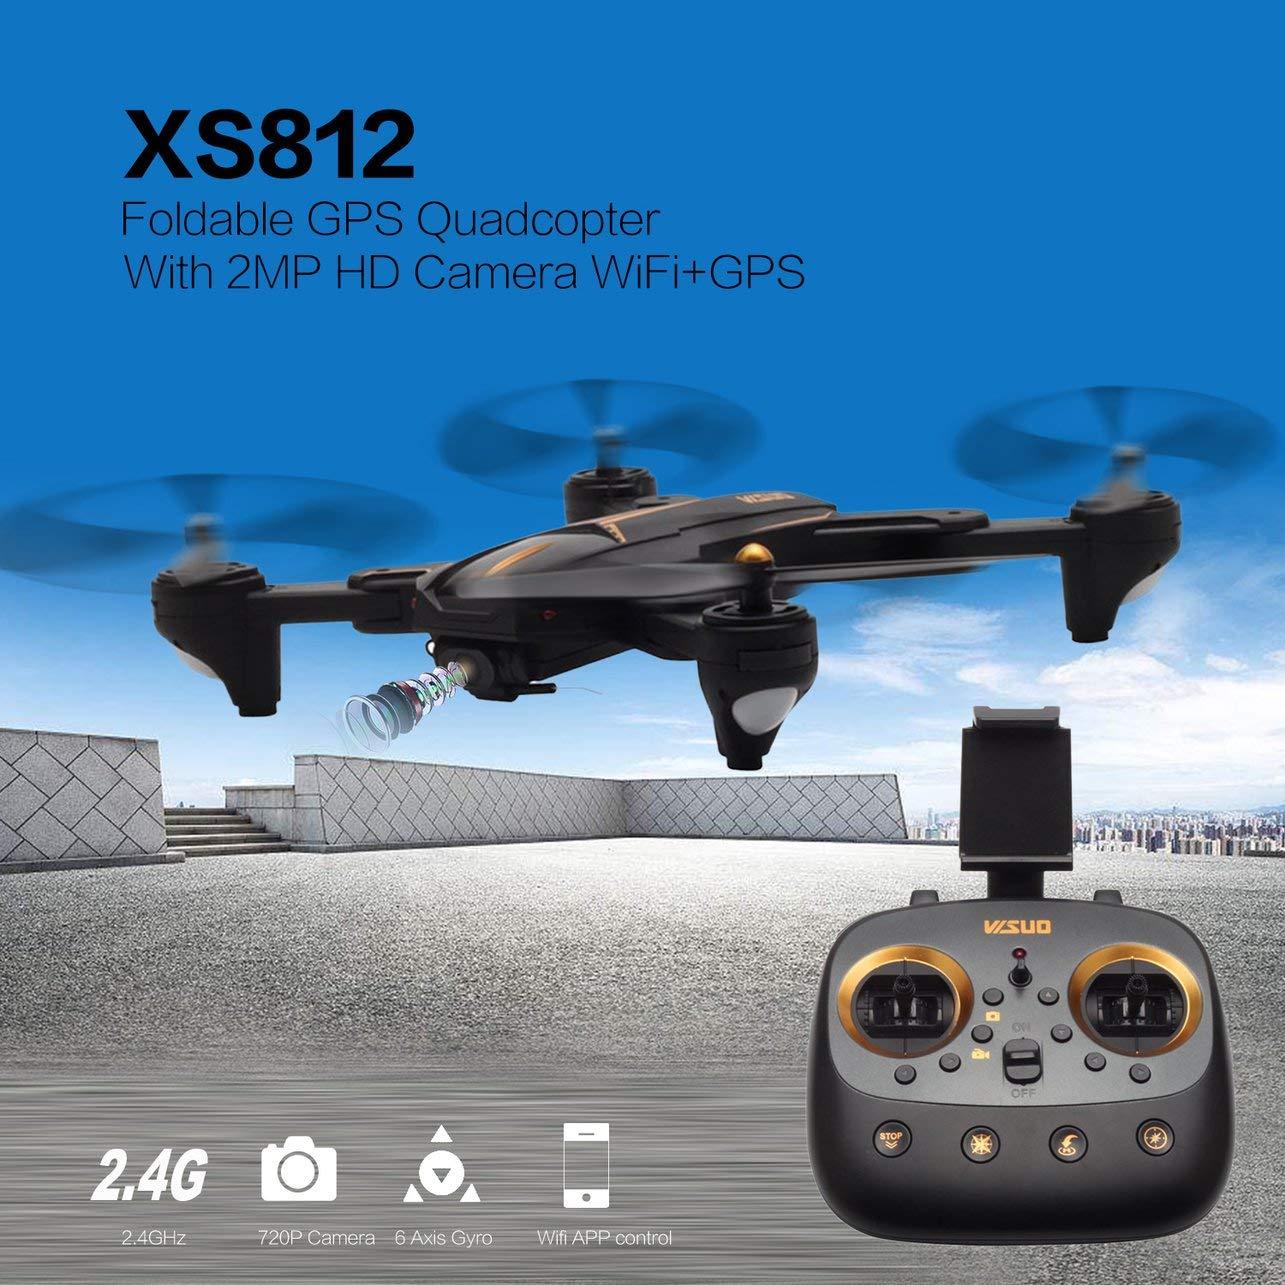 WOSOSYEYO XS812 Faltbare GPS Quadcopter RC Drohne mit 2MP HD Kamera WiFi + GPS Positioning Flugzeuge Höhe Hubschrauber Flugzeuge (Schwarz